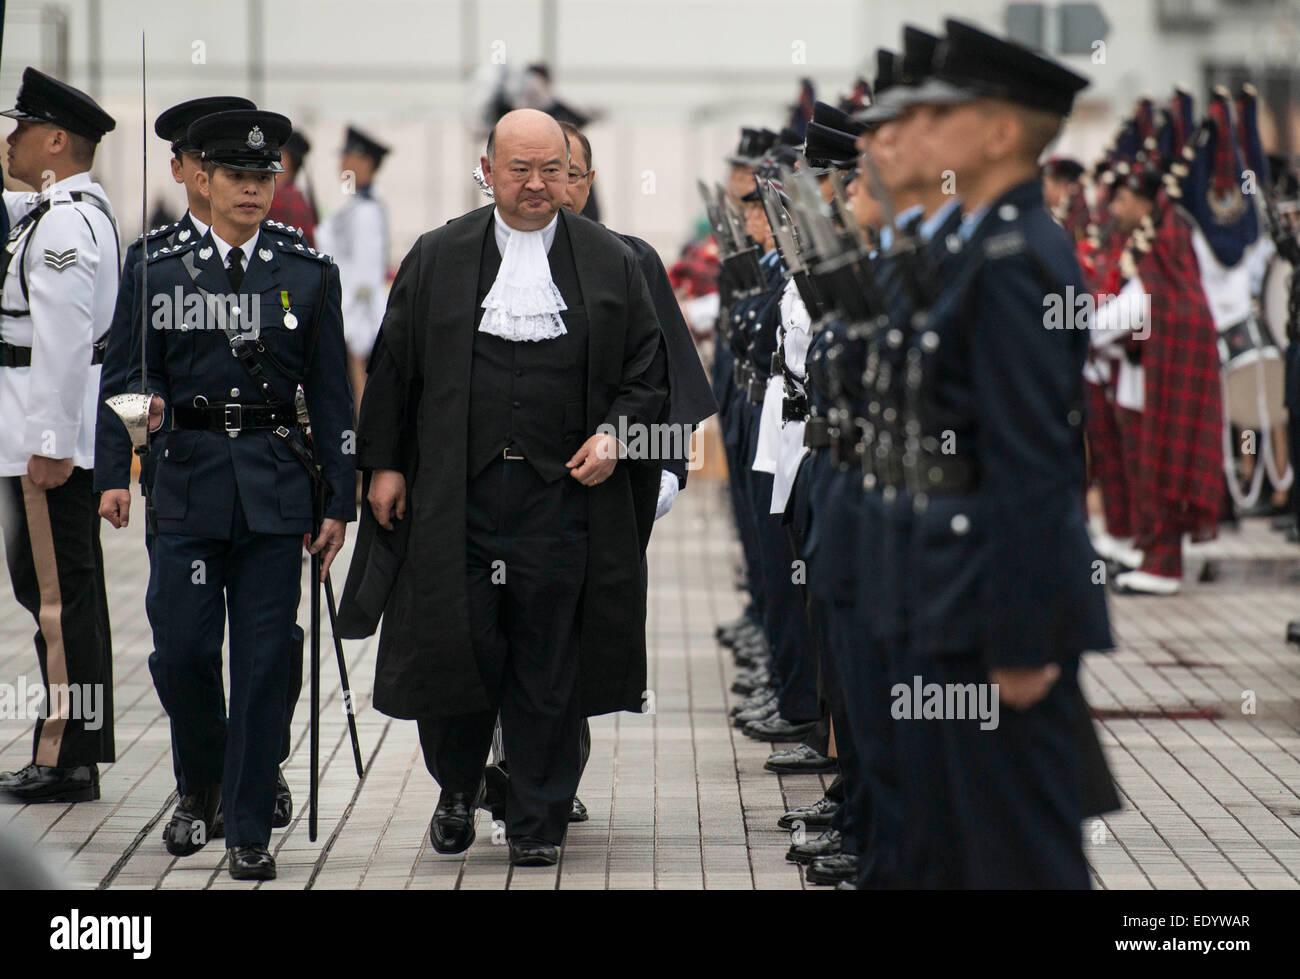 Hong Kong, China. 12th Jan, 2015. Geoffrey Ma Tao-li (C), Chief Justice of the Court of Final Appeal of Hong Kong Stock Photo